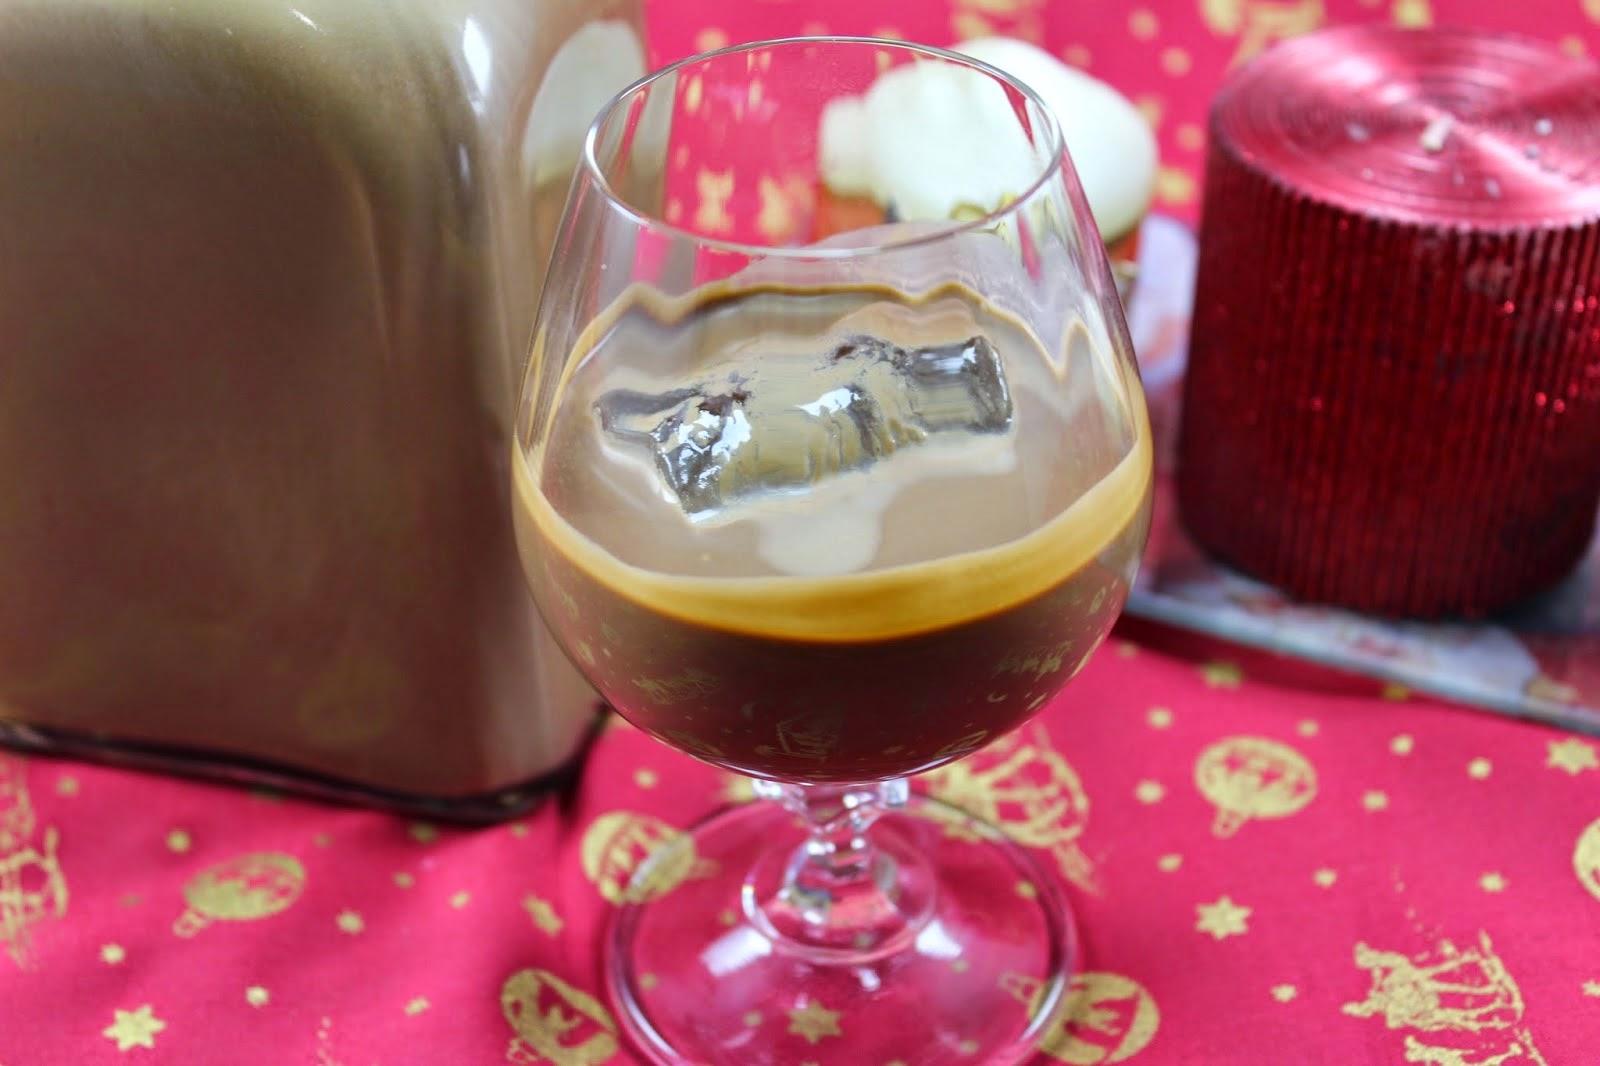 Crema de chocolate (Bebida) Ana Sevilla cocina tradicional